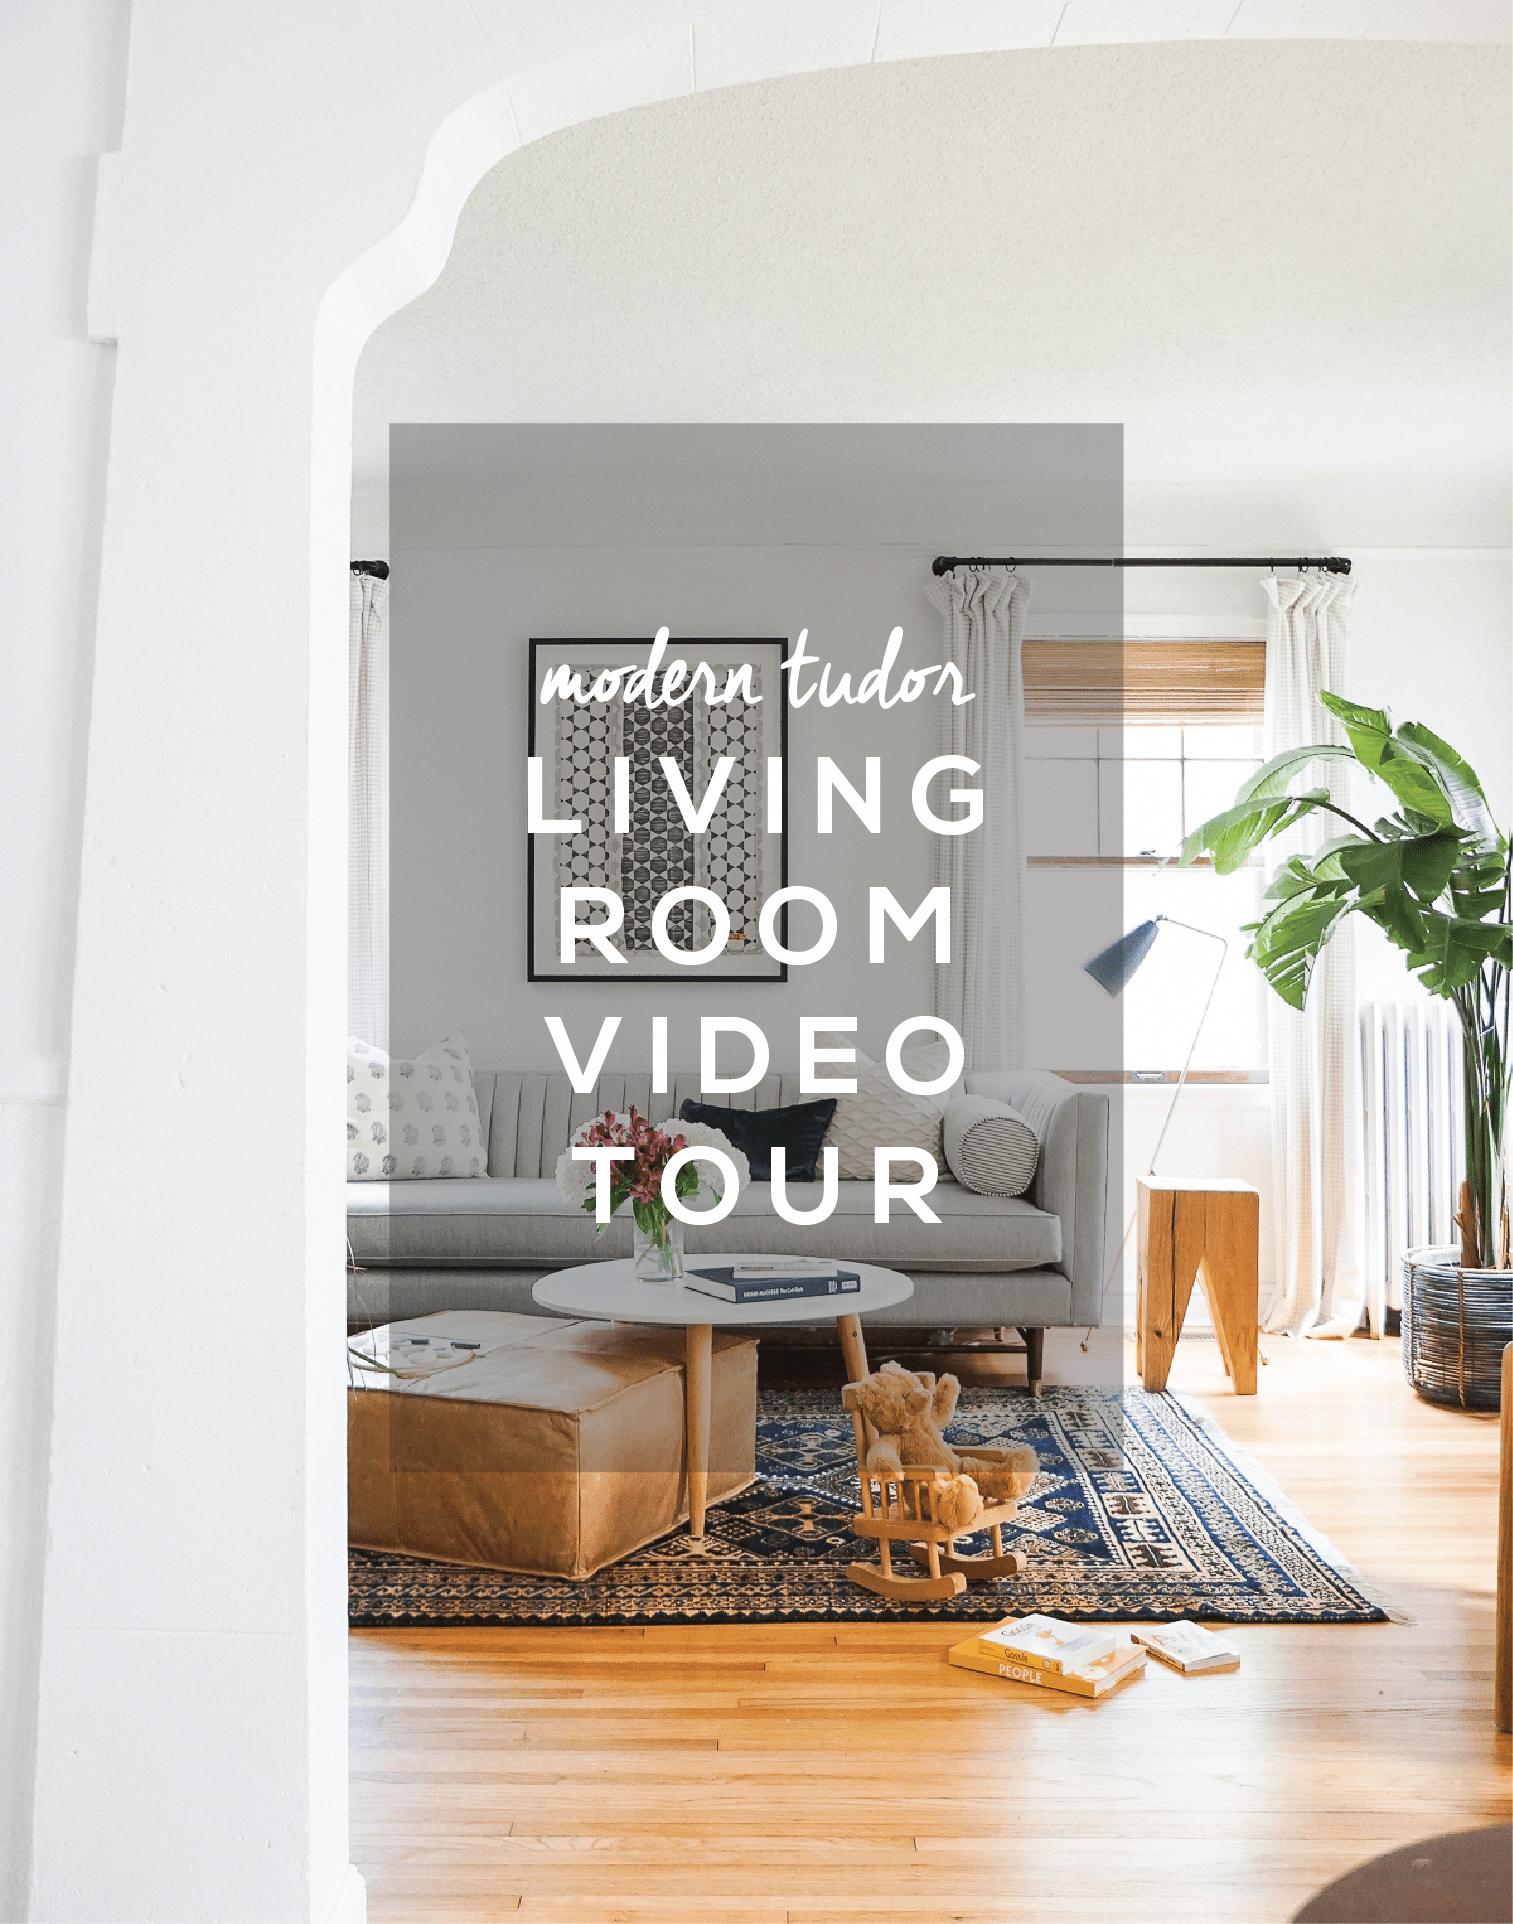 Living Room Layout Latest Interior Design For Living Room Lounge Furnishing Ideas 20190119 Room Home Decor Bedroom